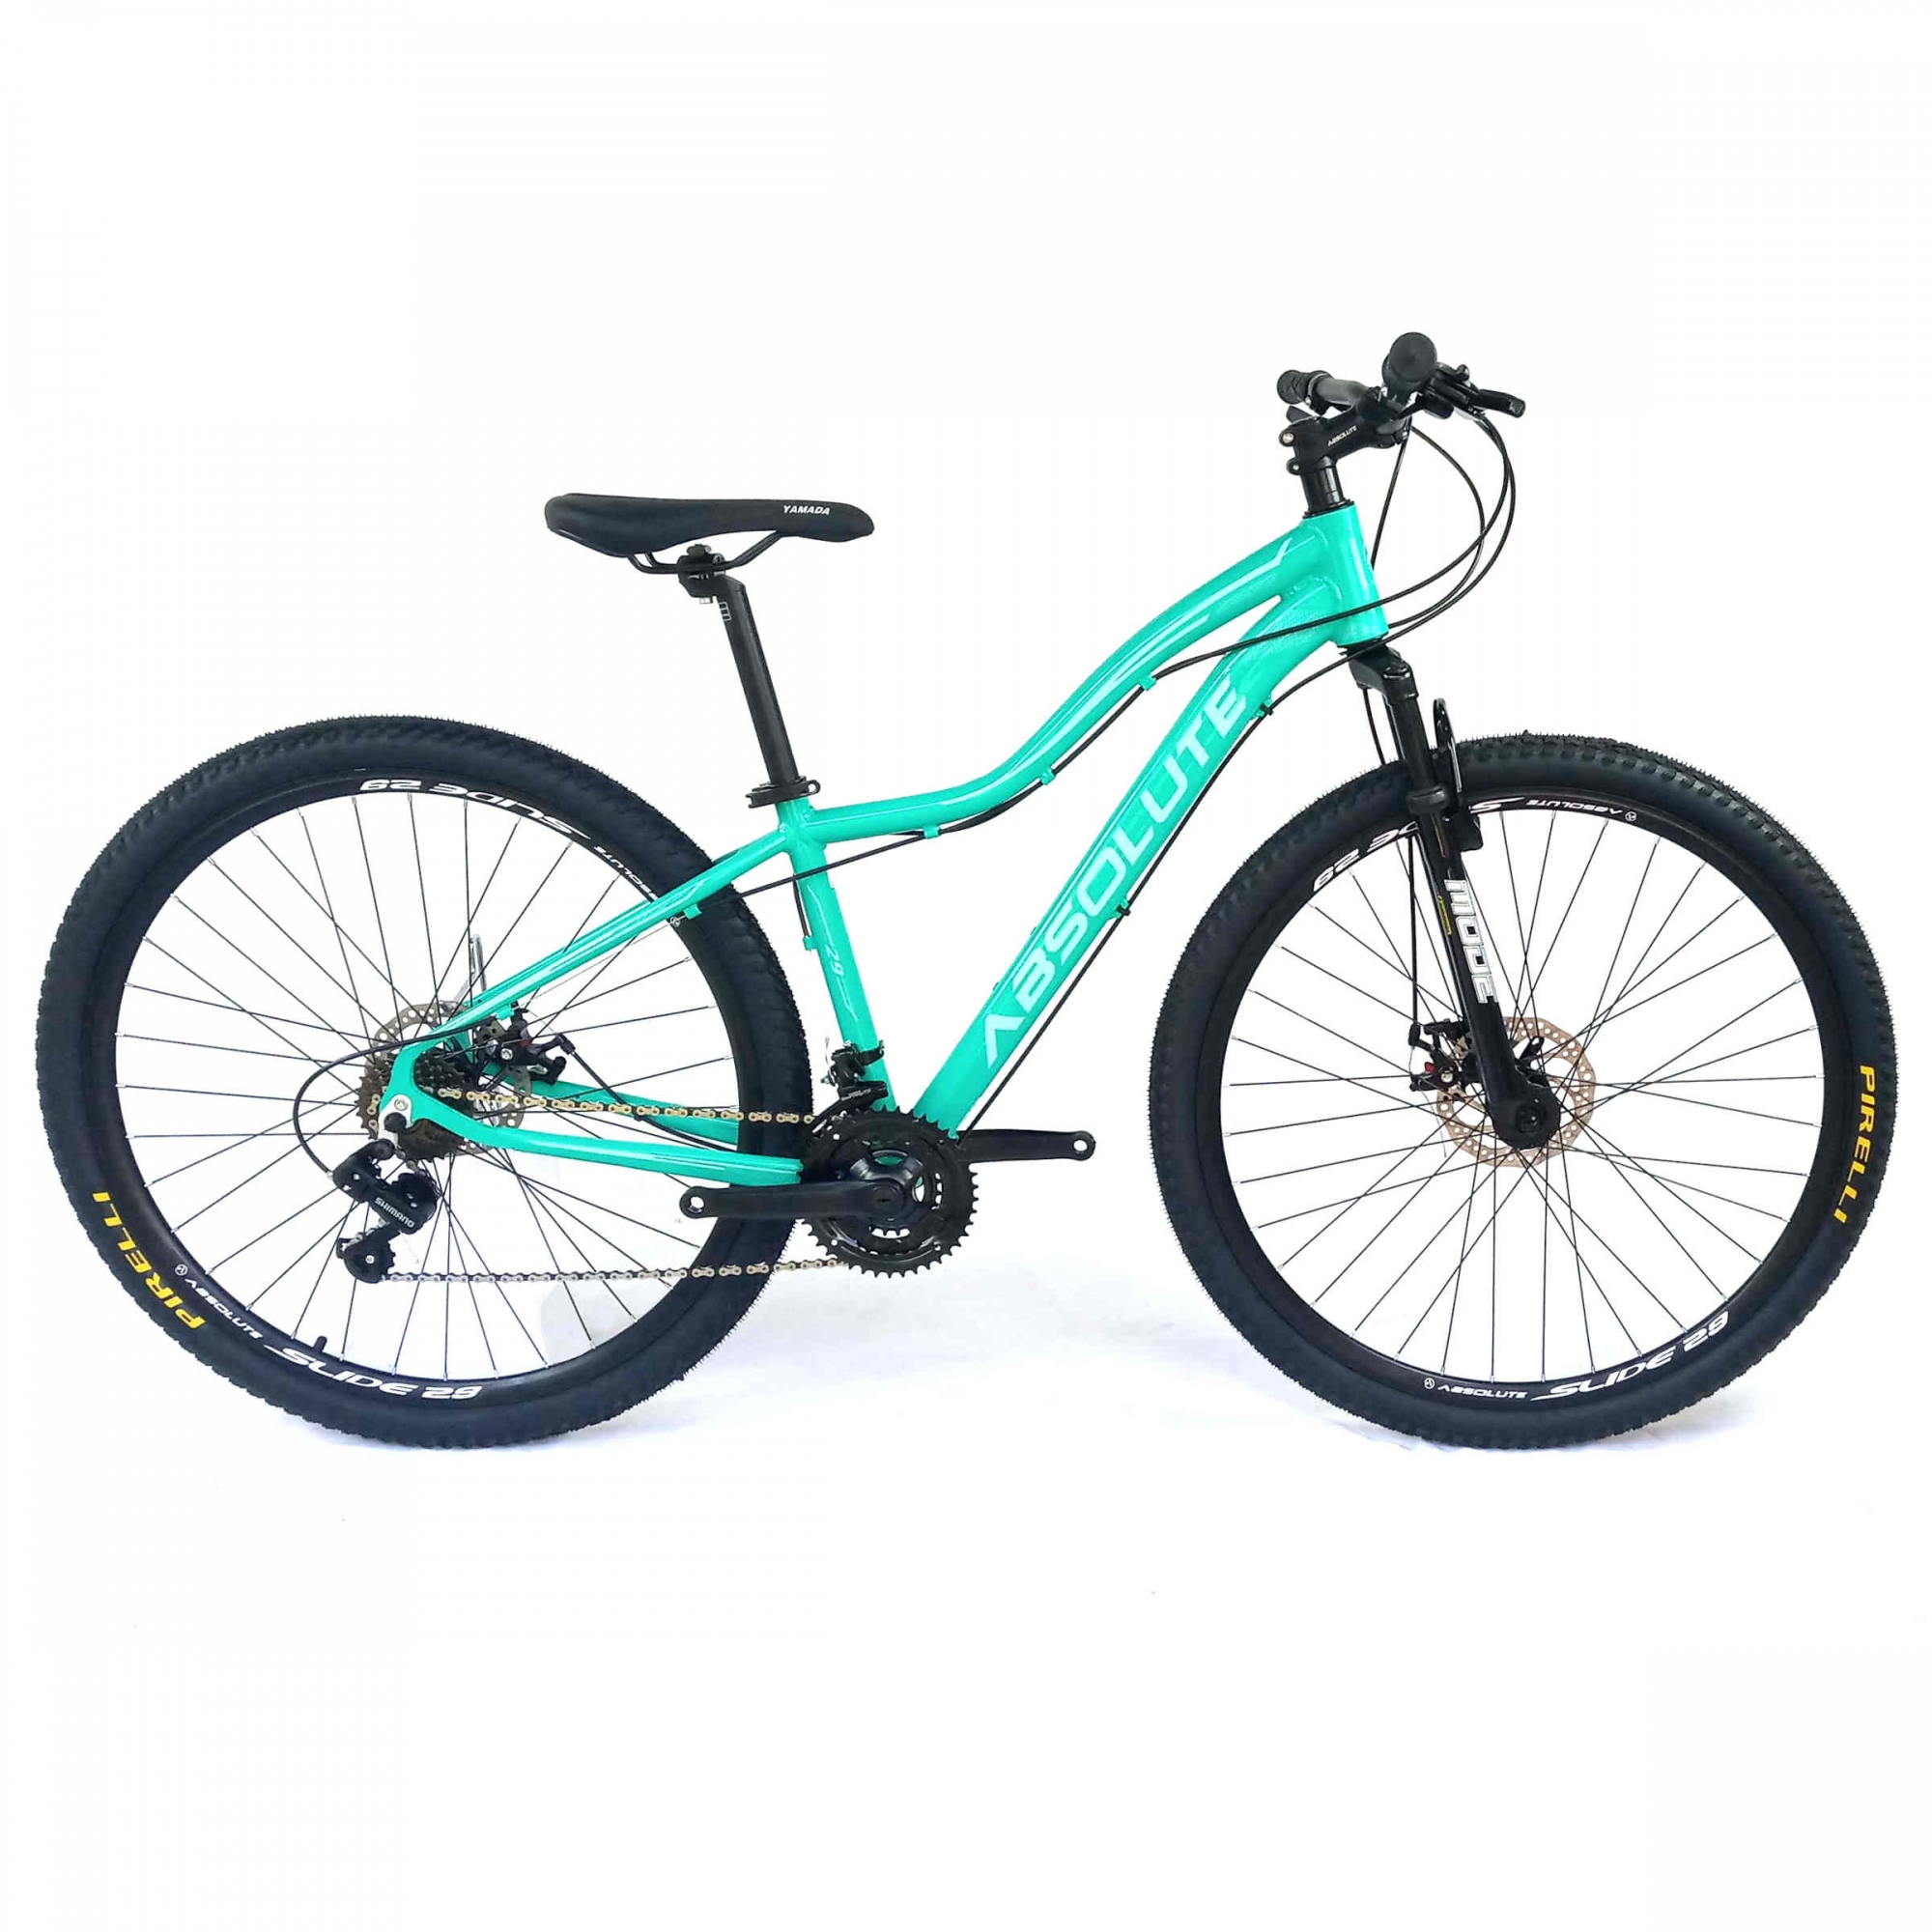 Bicicleta Absolute Hera Aro 29 Feminina  Azul